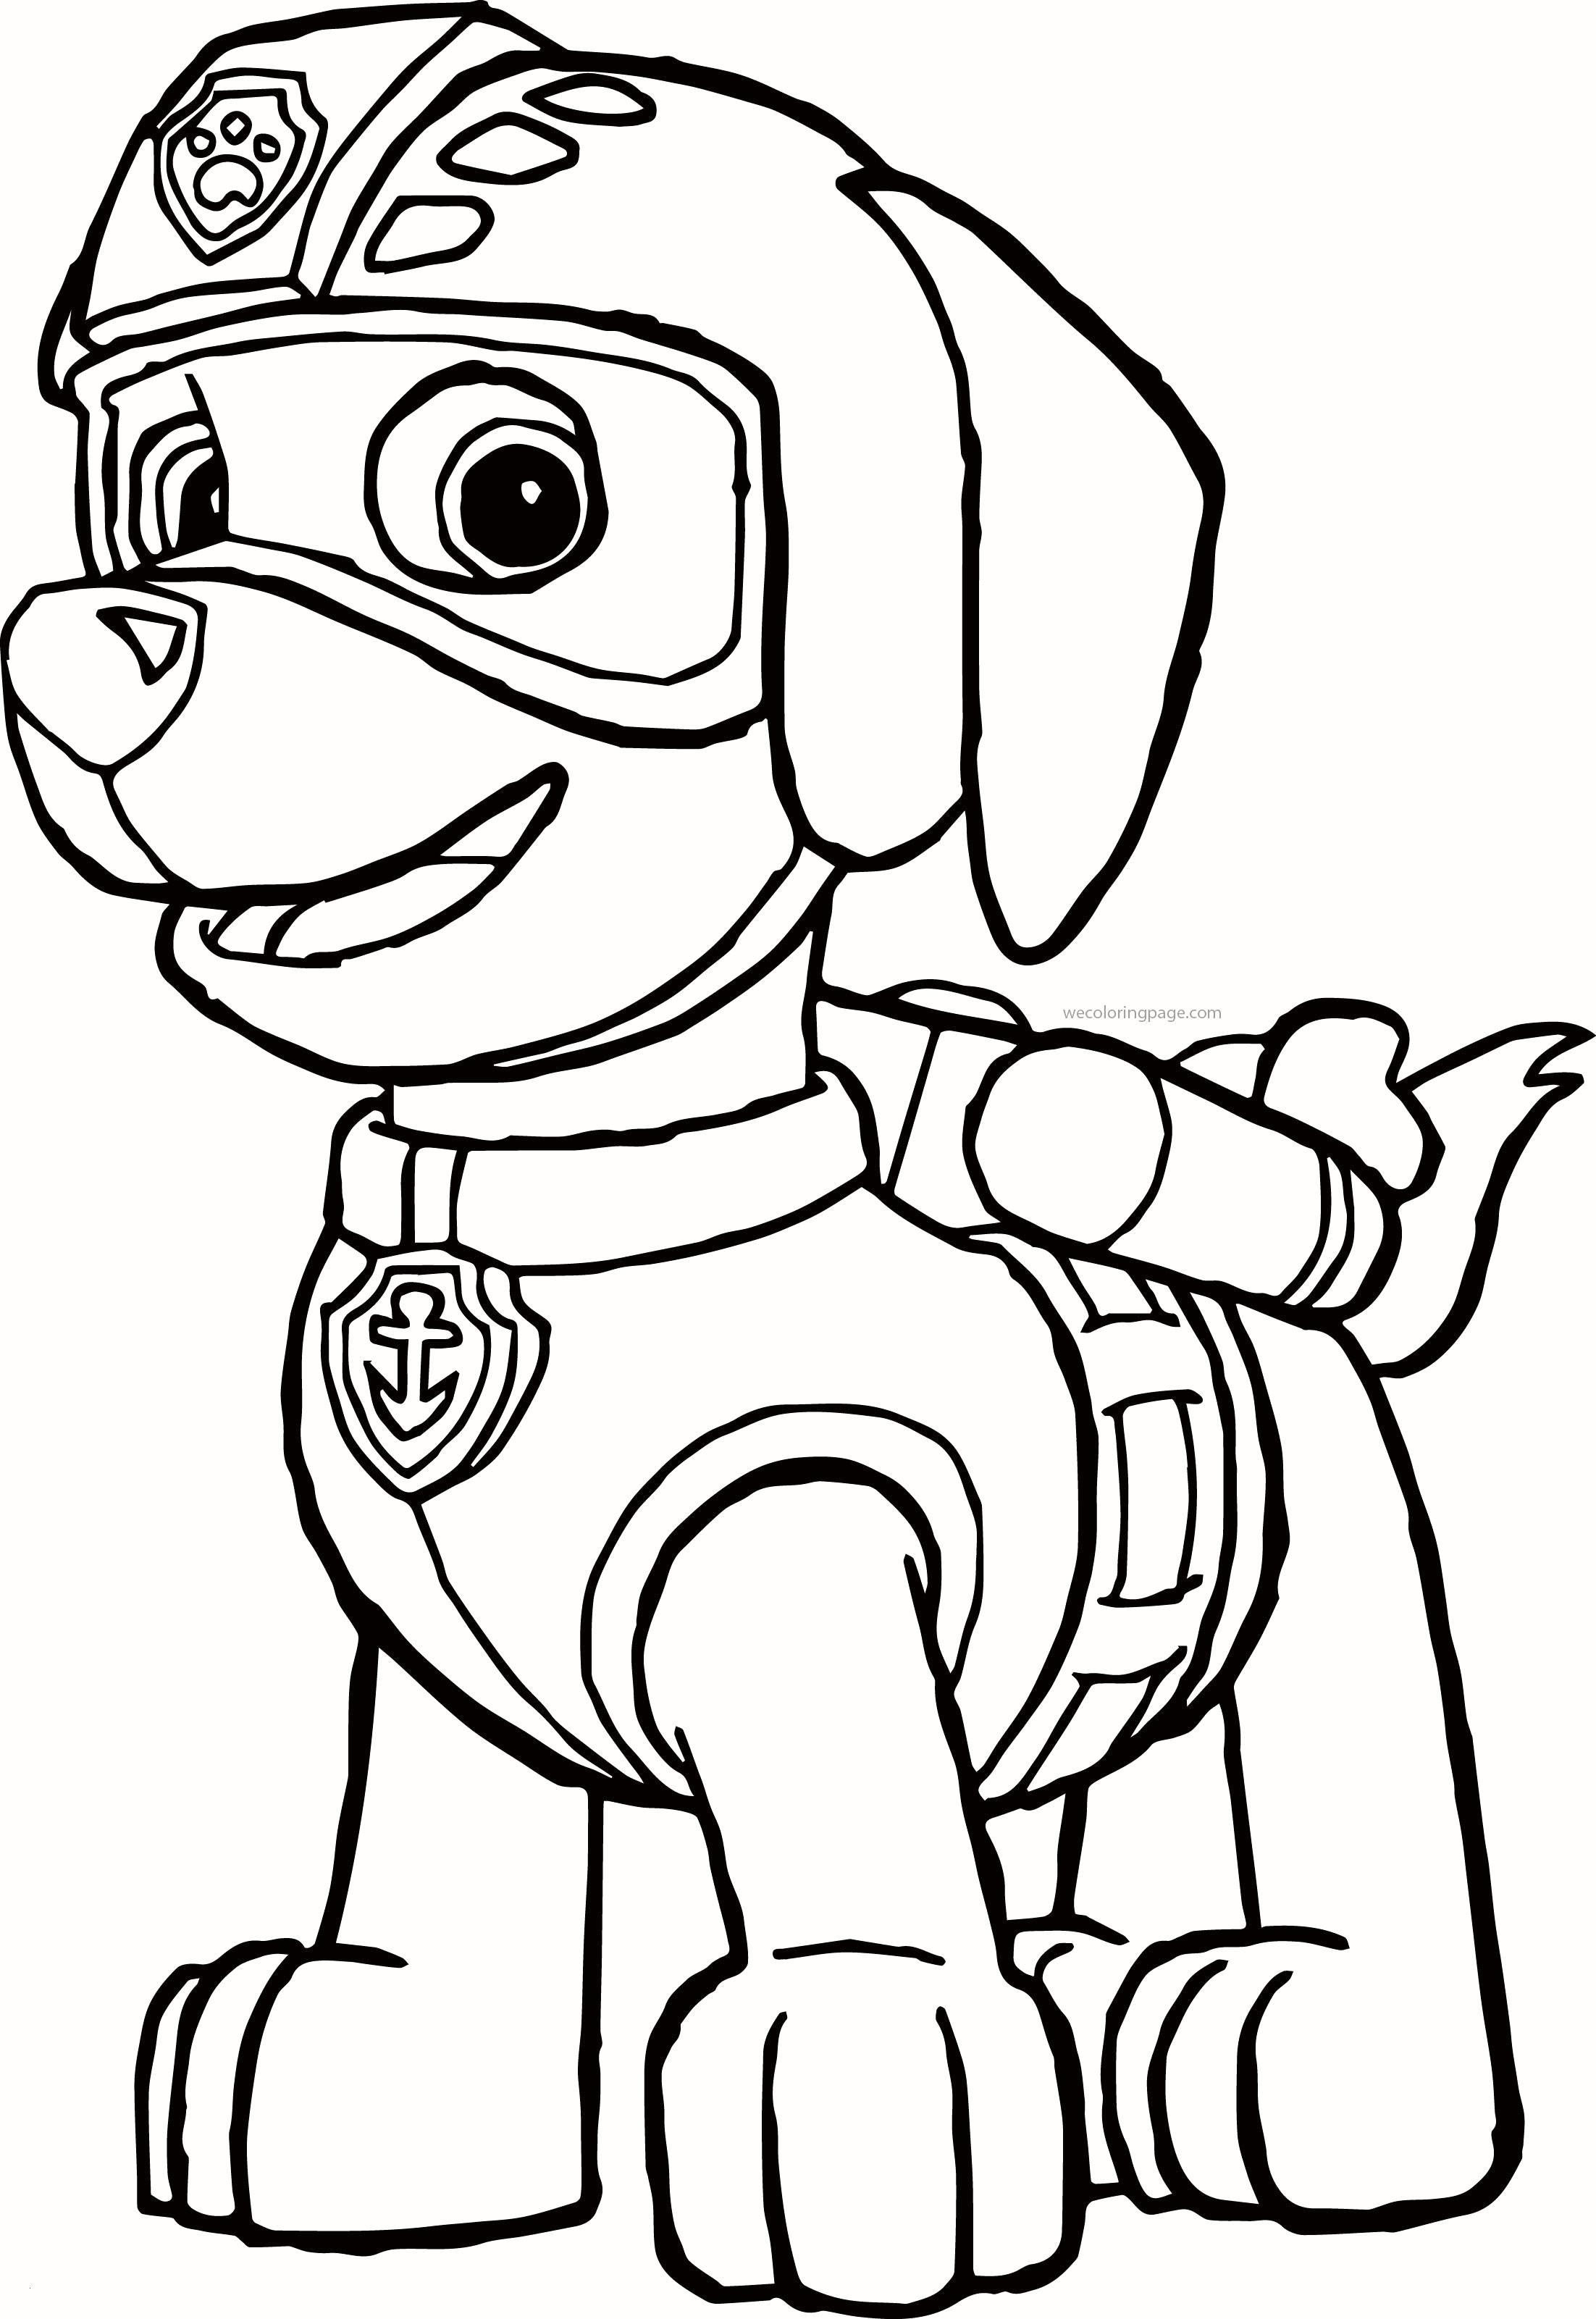 Ausmalbilder Paw Patrol Frisch 30 Unique Paw Patrol Coloring Pages Robo Dog Elegant Ausmalbilder Fotografieren